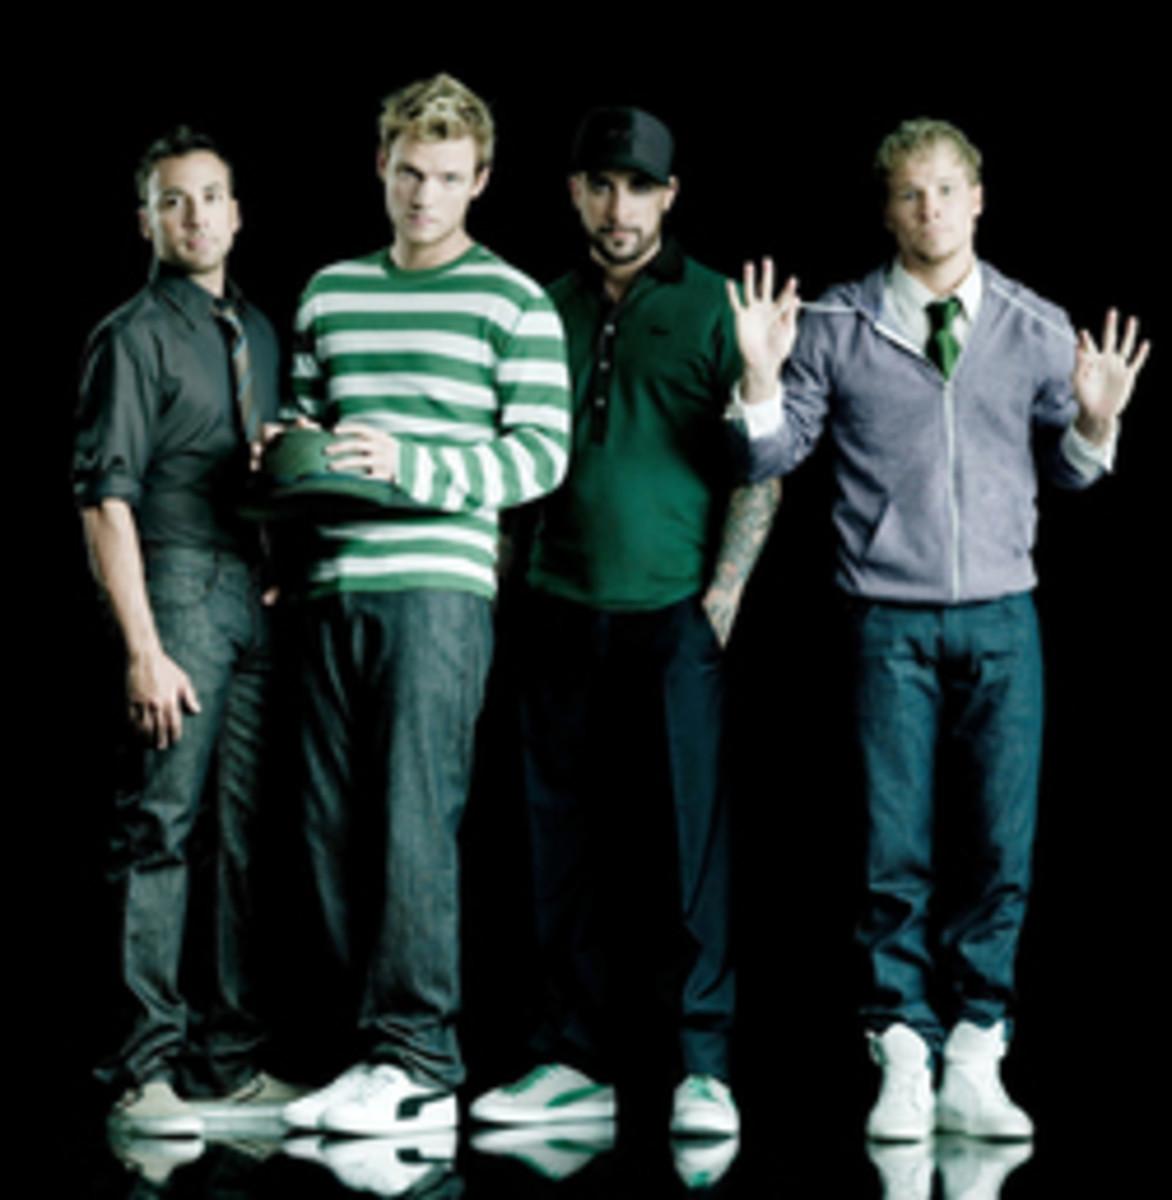 Backstreet Boys minus Kevin